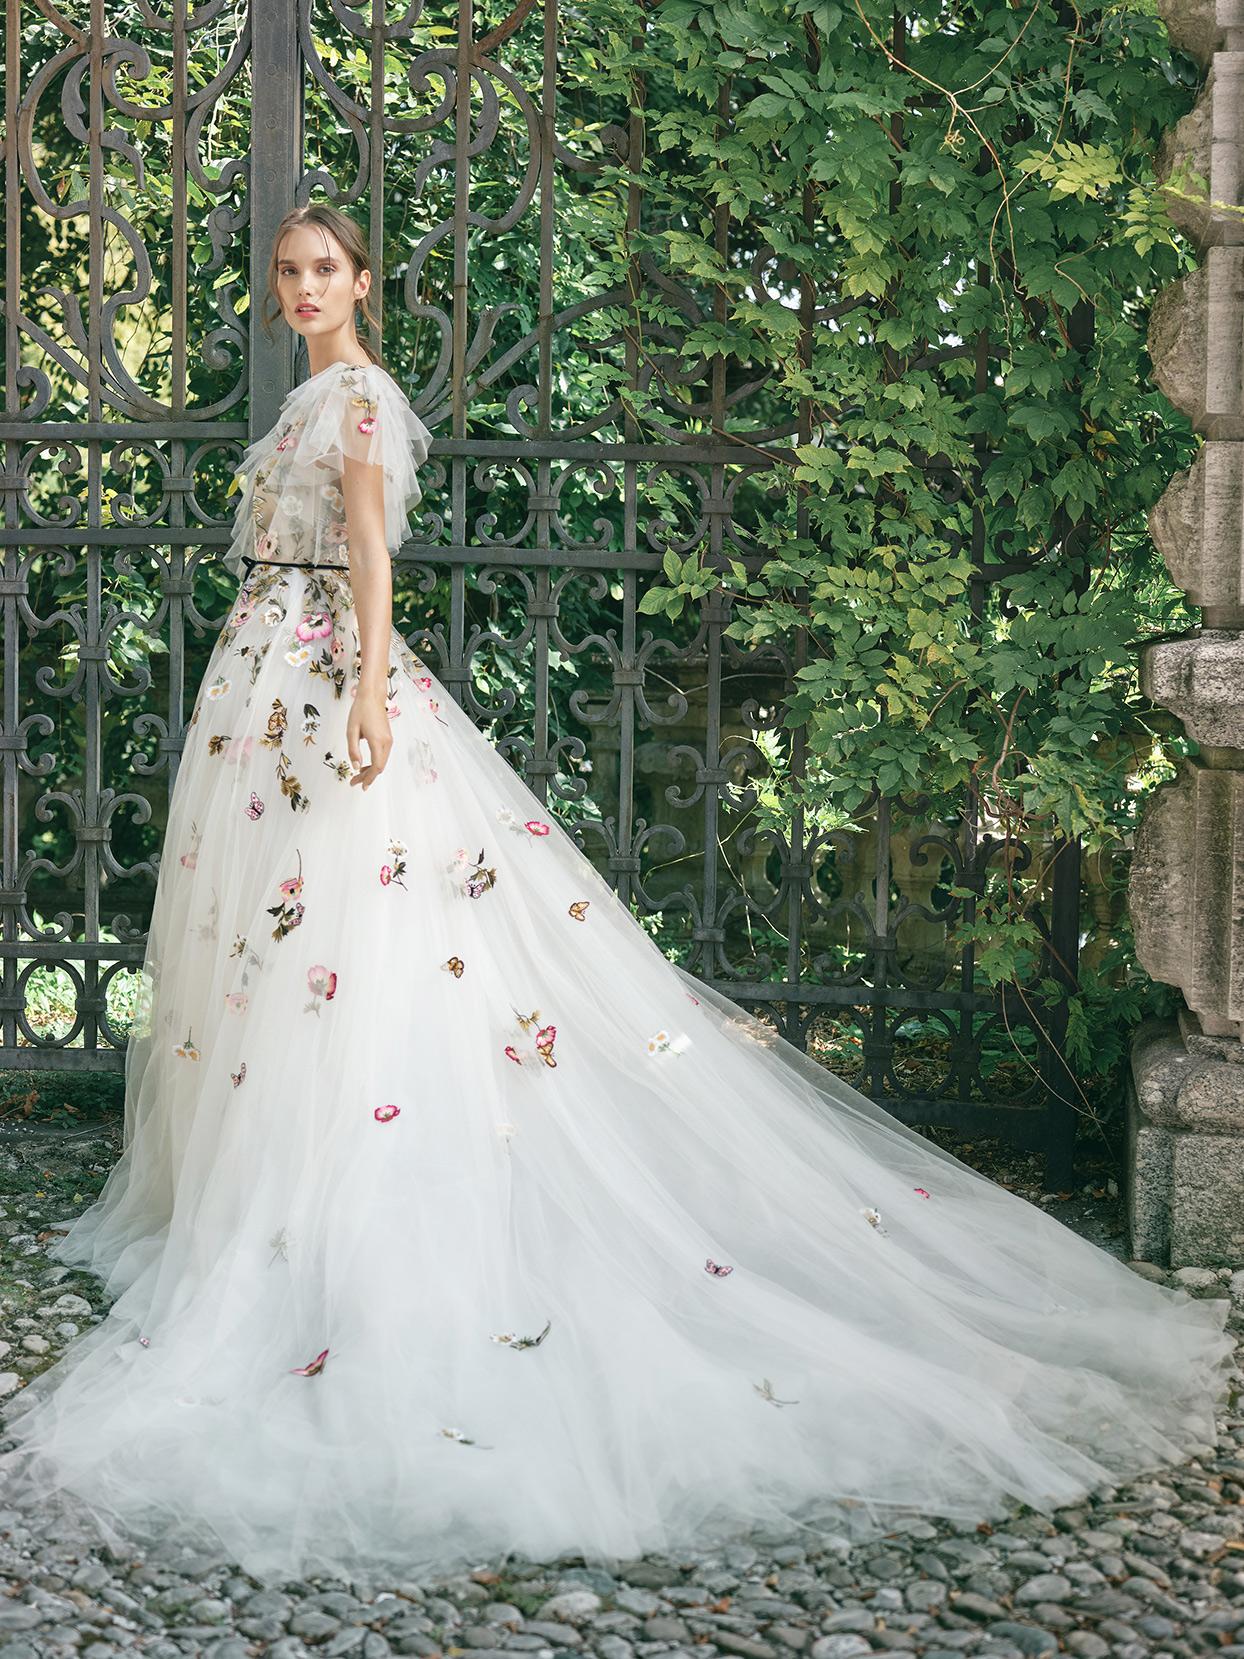 monique lhuillier tulle ball gown wedding dress fall 2020